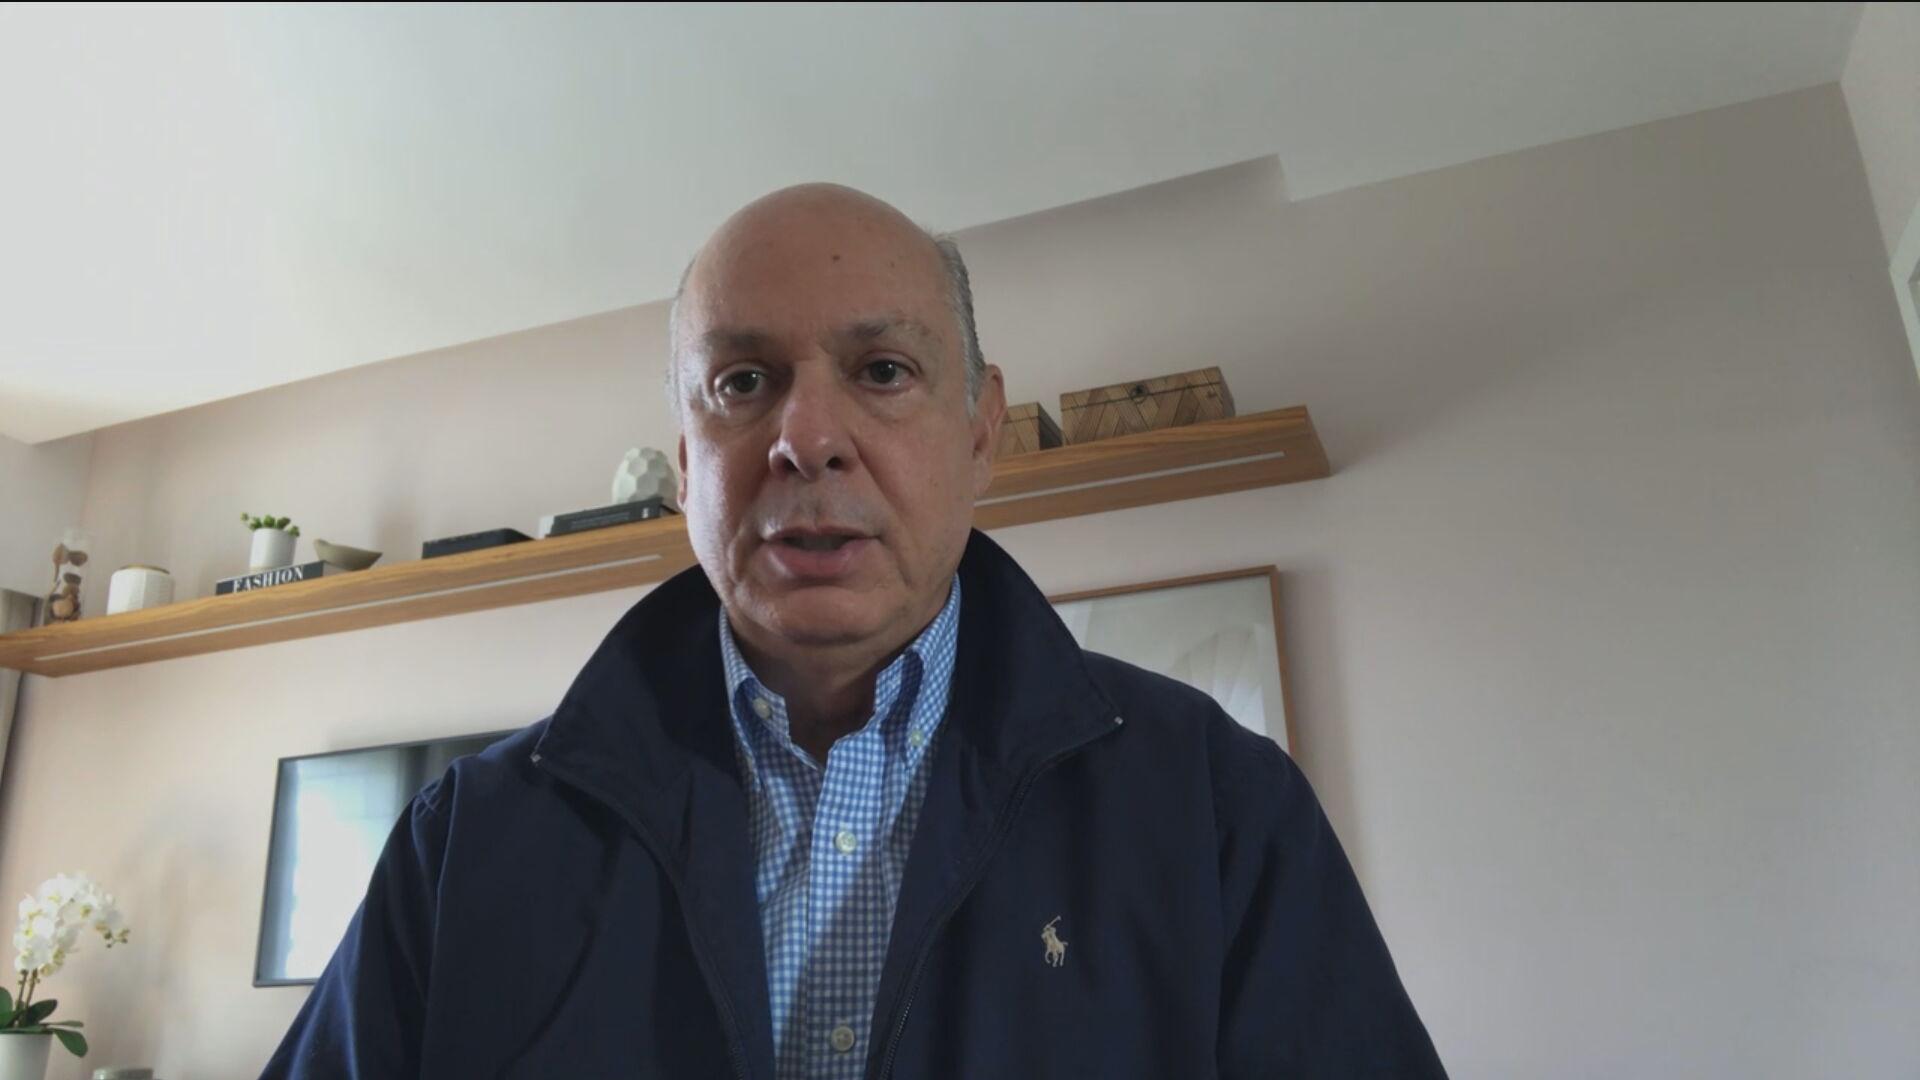 César Teixeira, CEO de Consumo e Pequenas e Médias empresas da Claro em entrevis